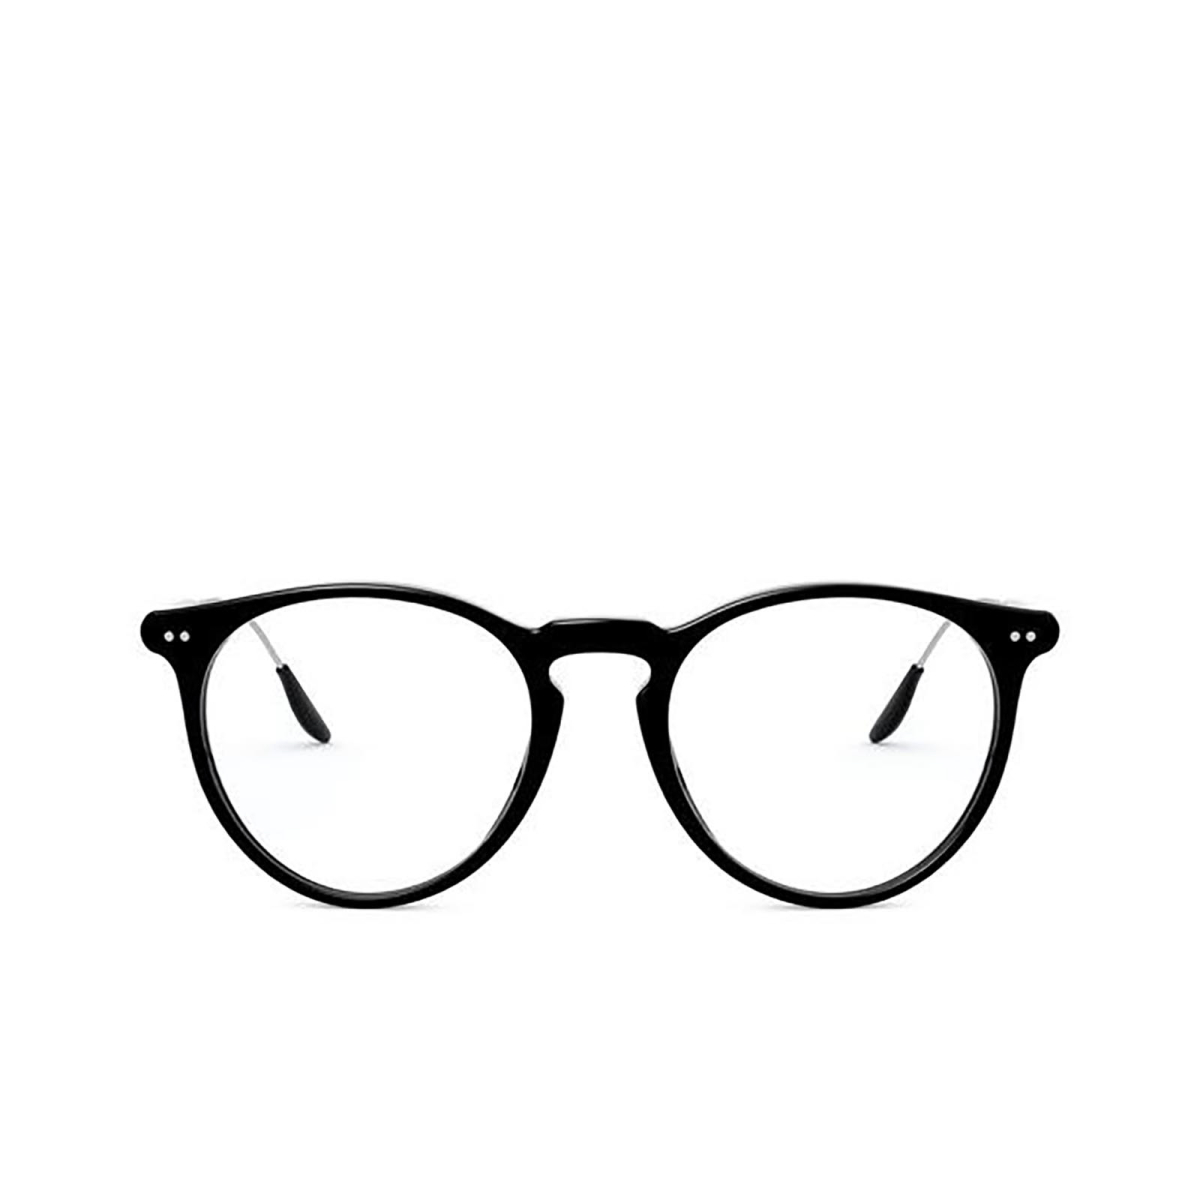 Ralph Lauren® Round Eyeglasses: RL6195P color Shiny Black 5001.